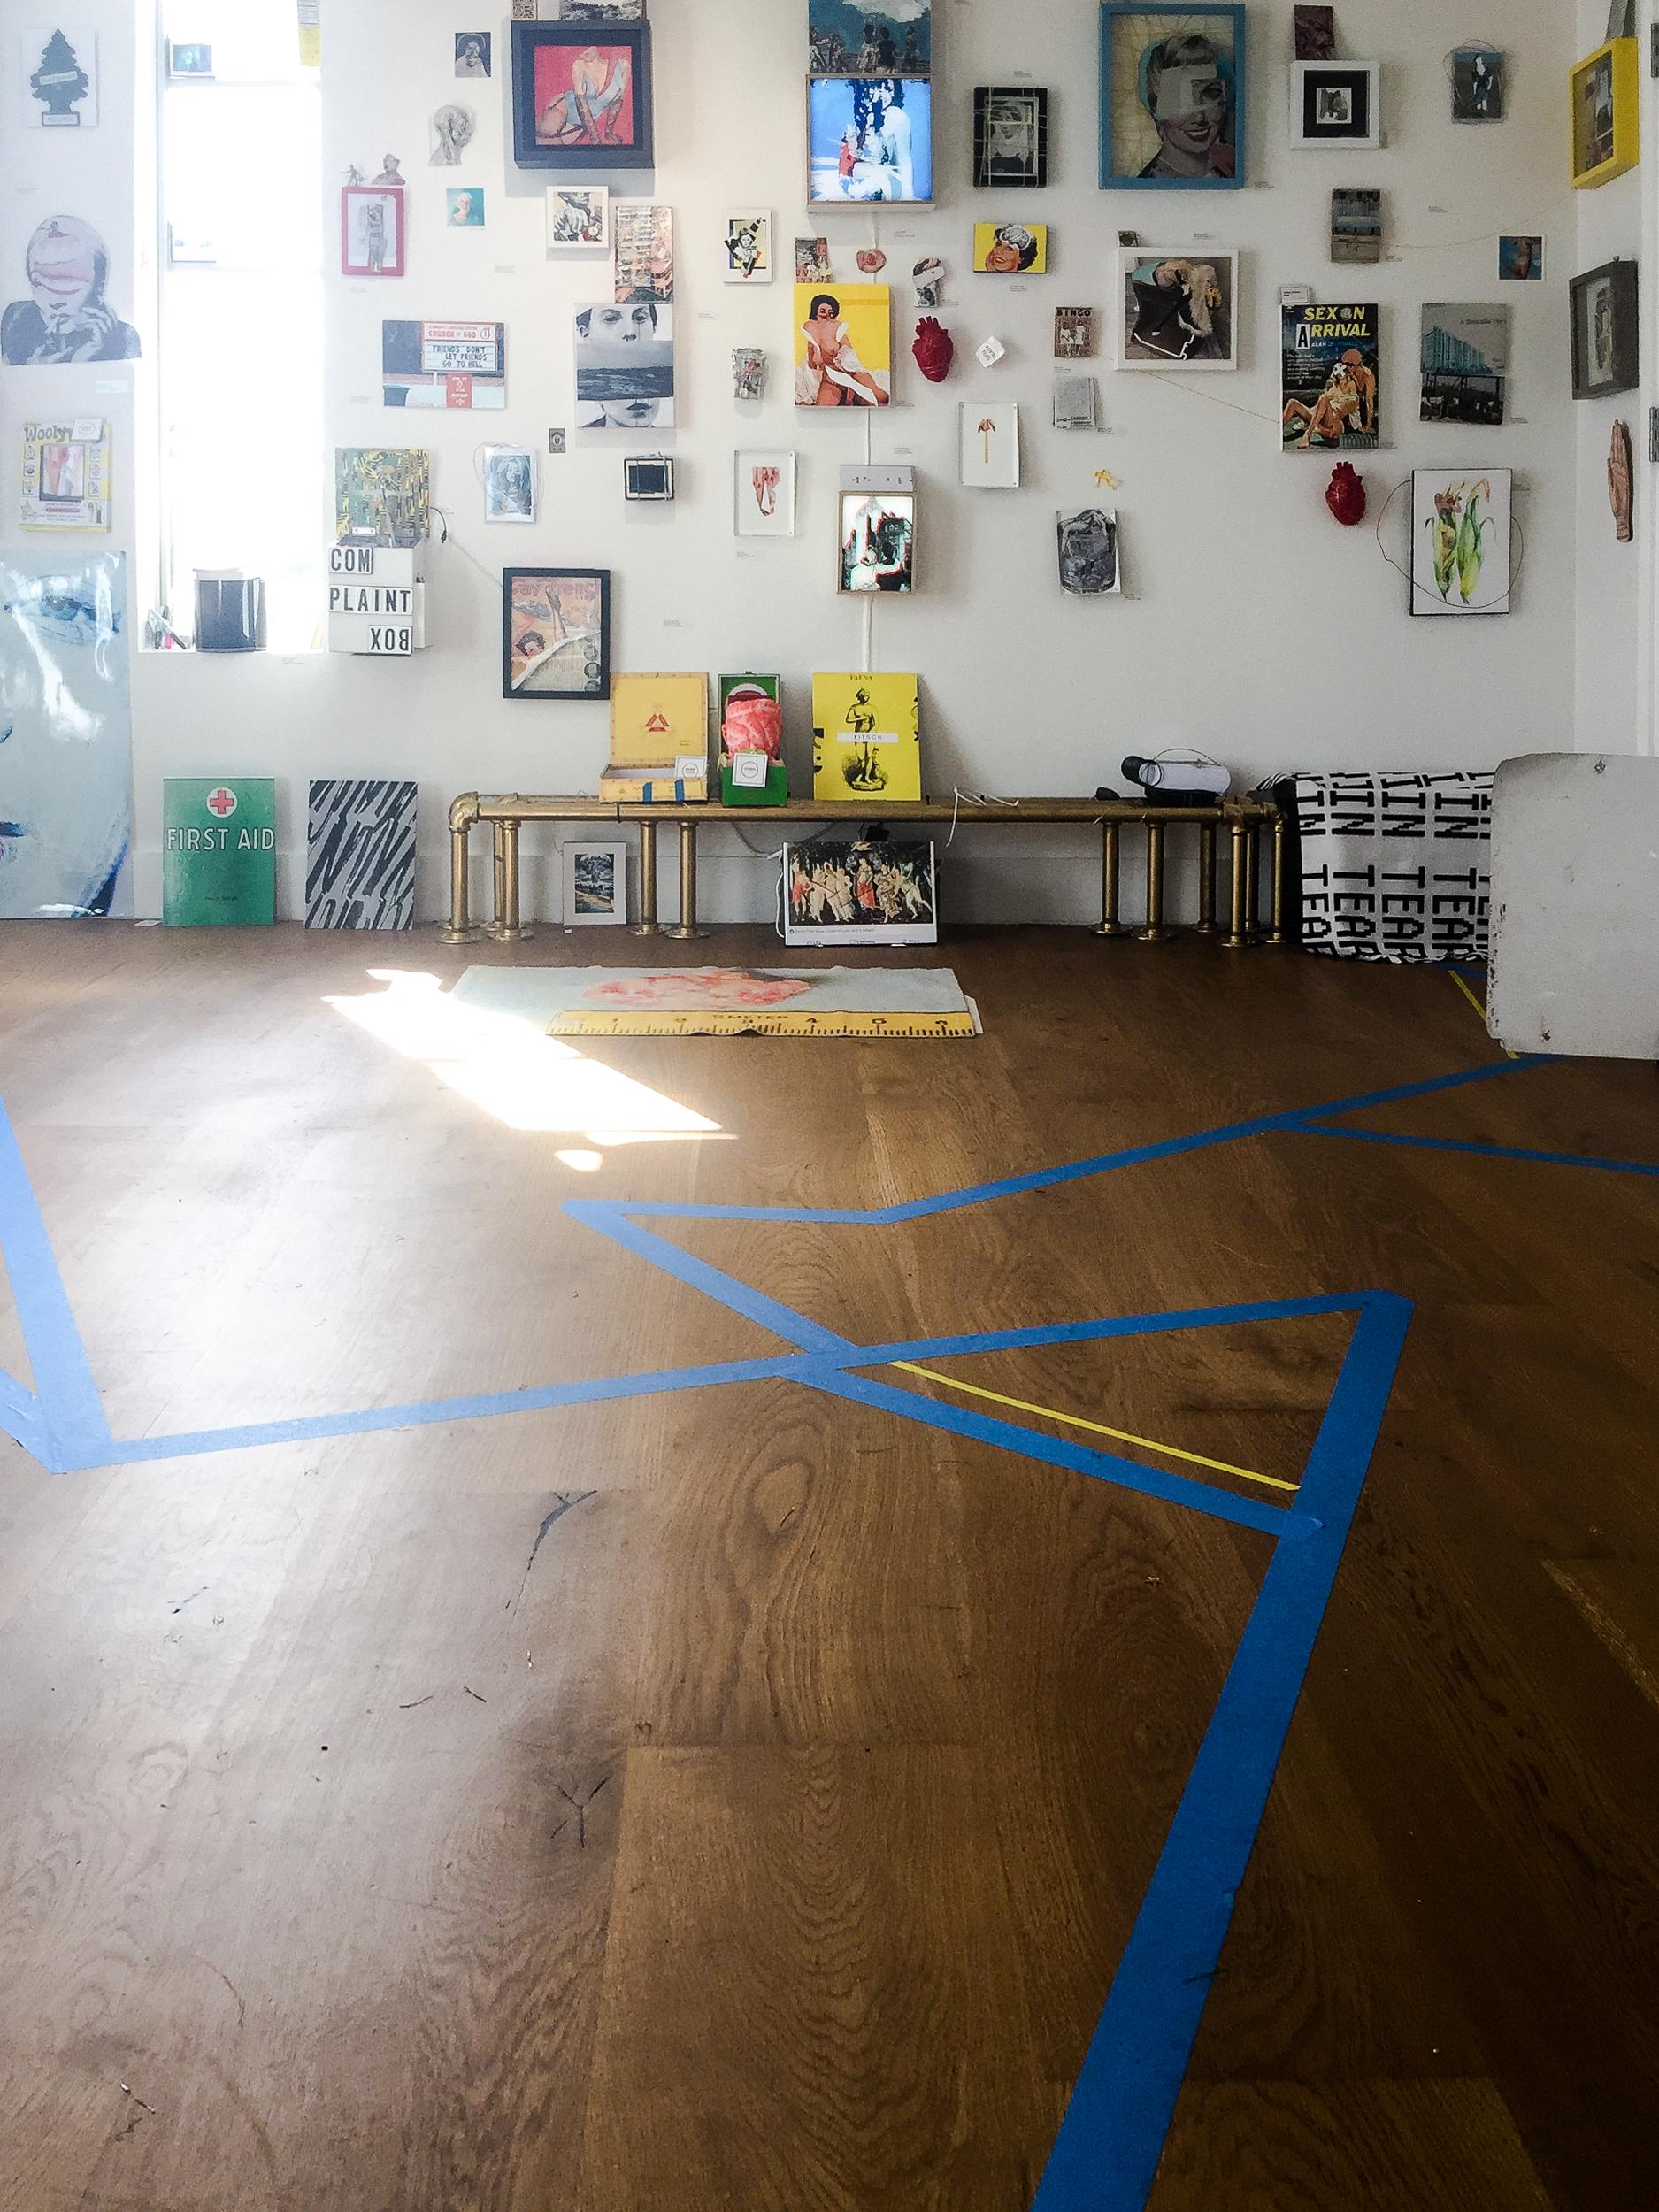 Faena-Exhibition-Images-42.jpg